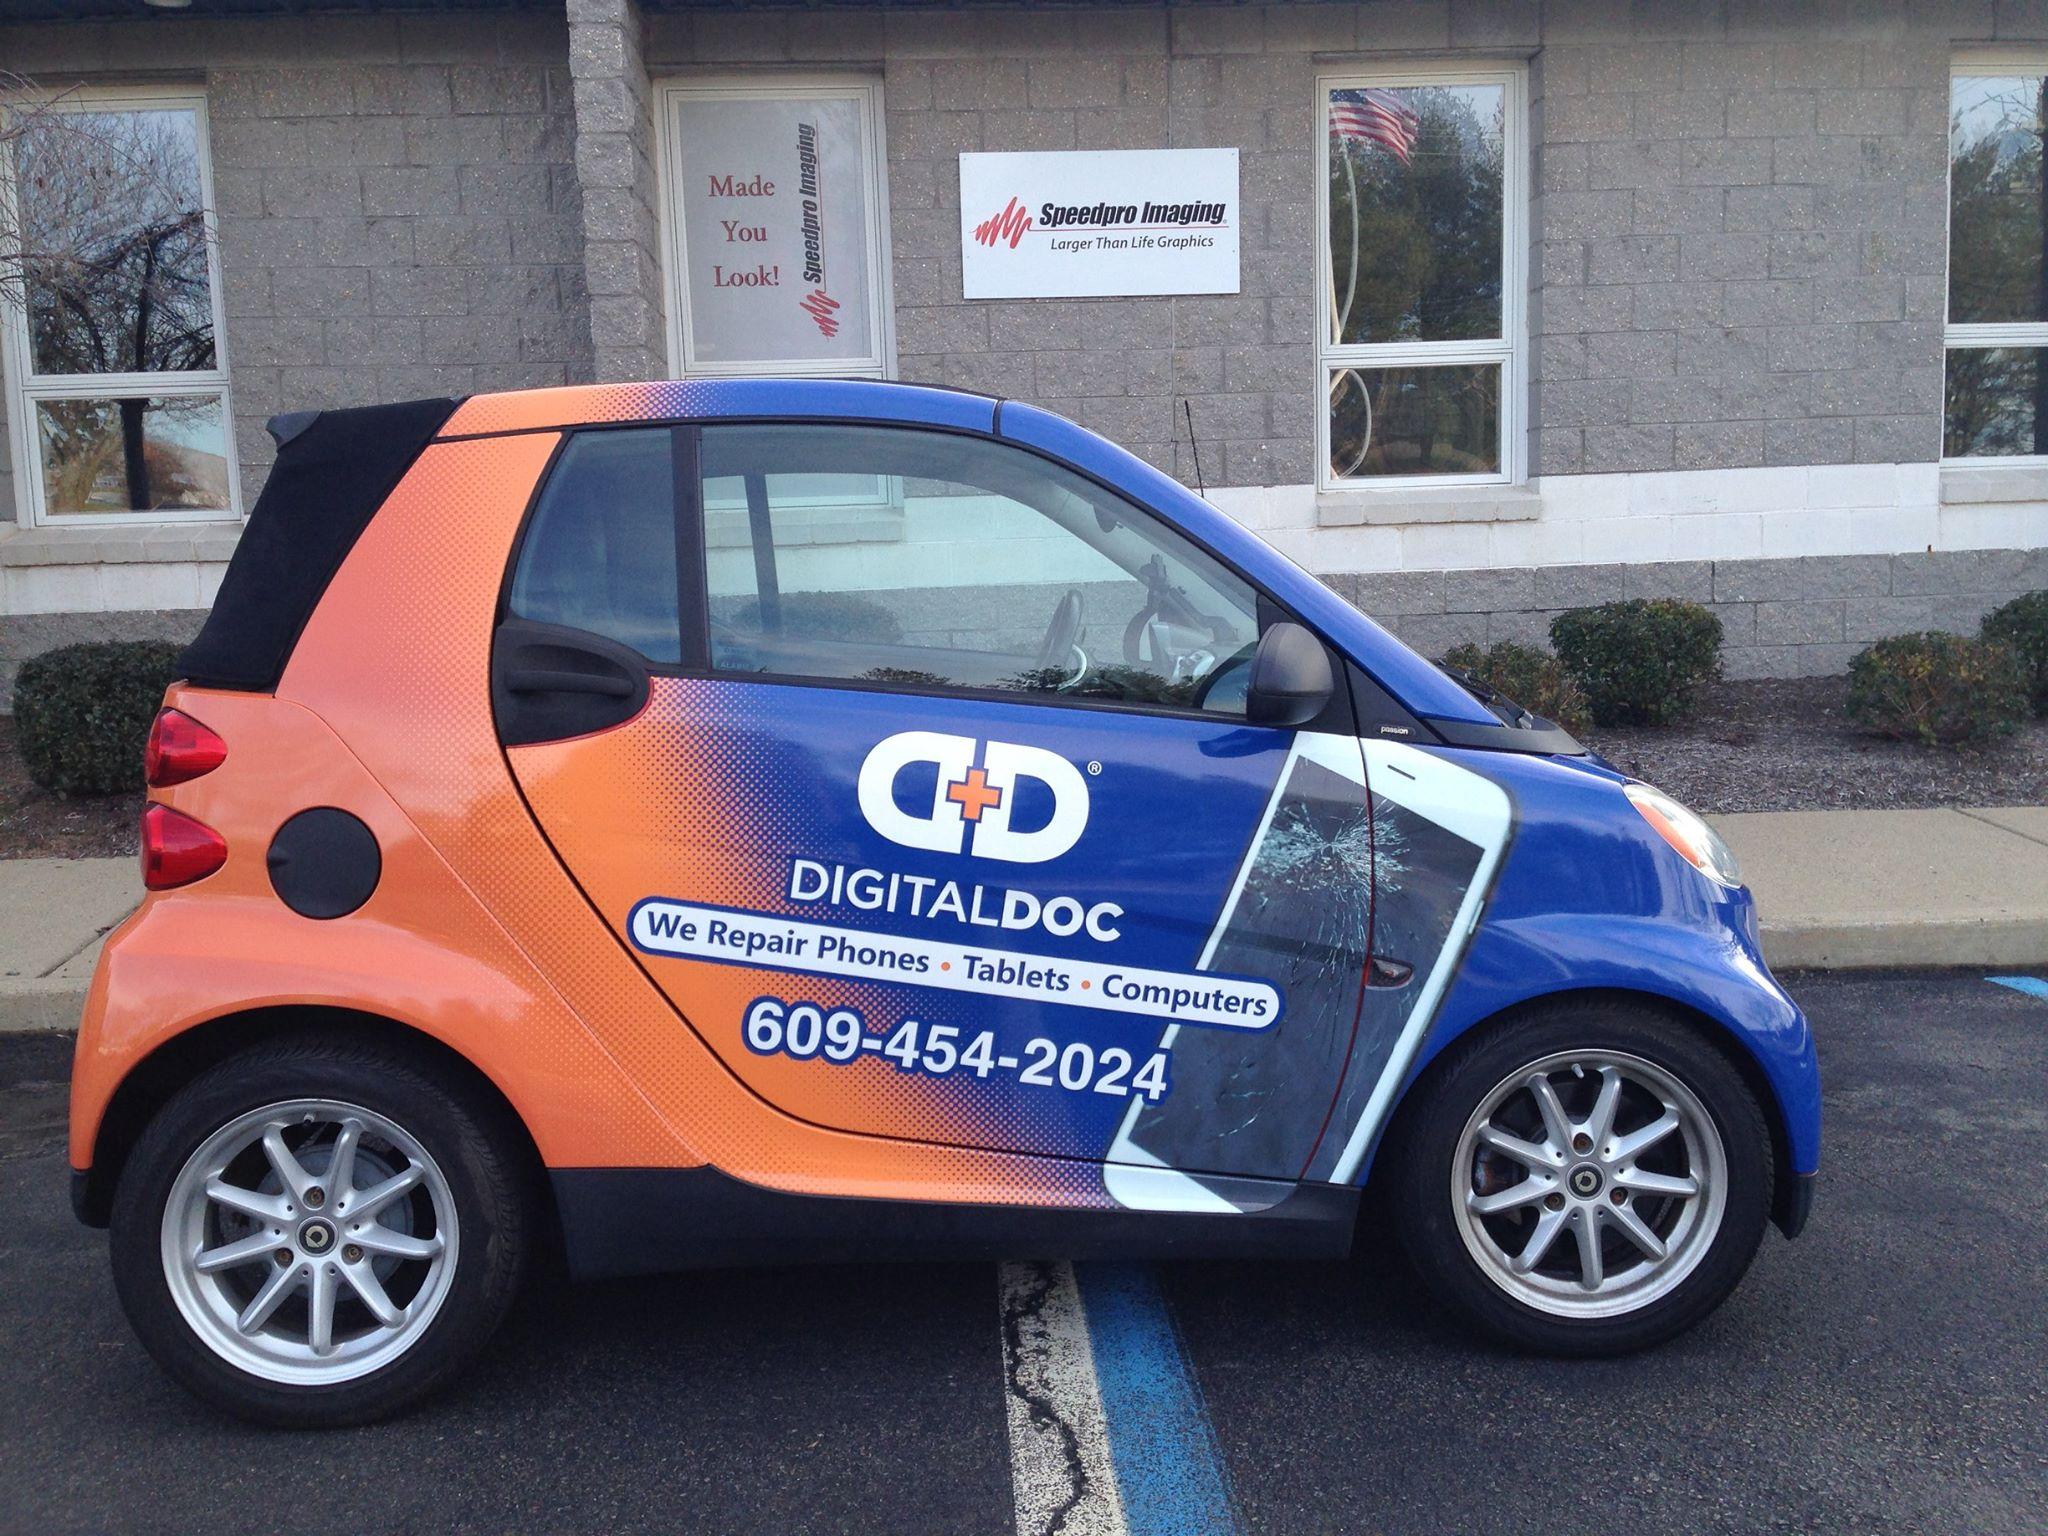 Marketing with Vehicle Wraps